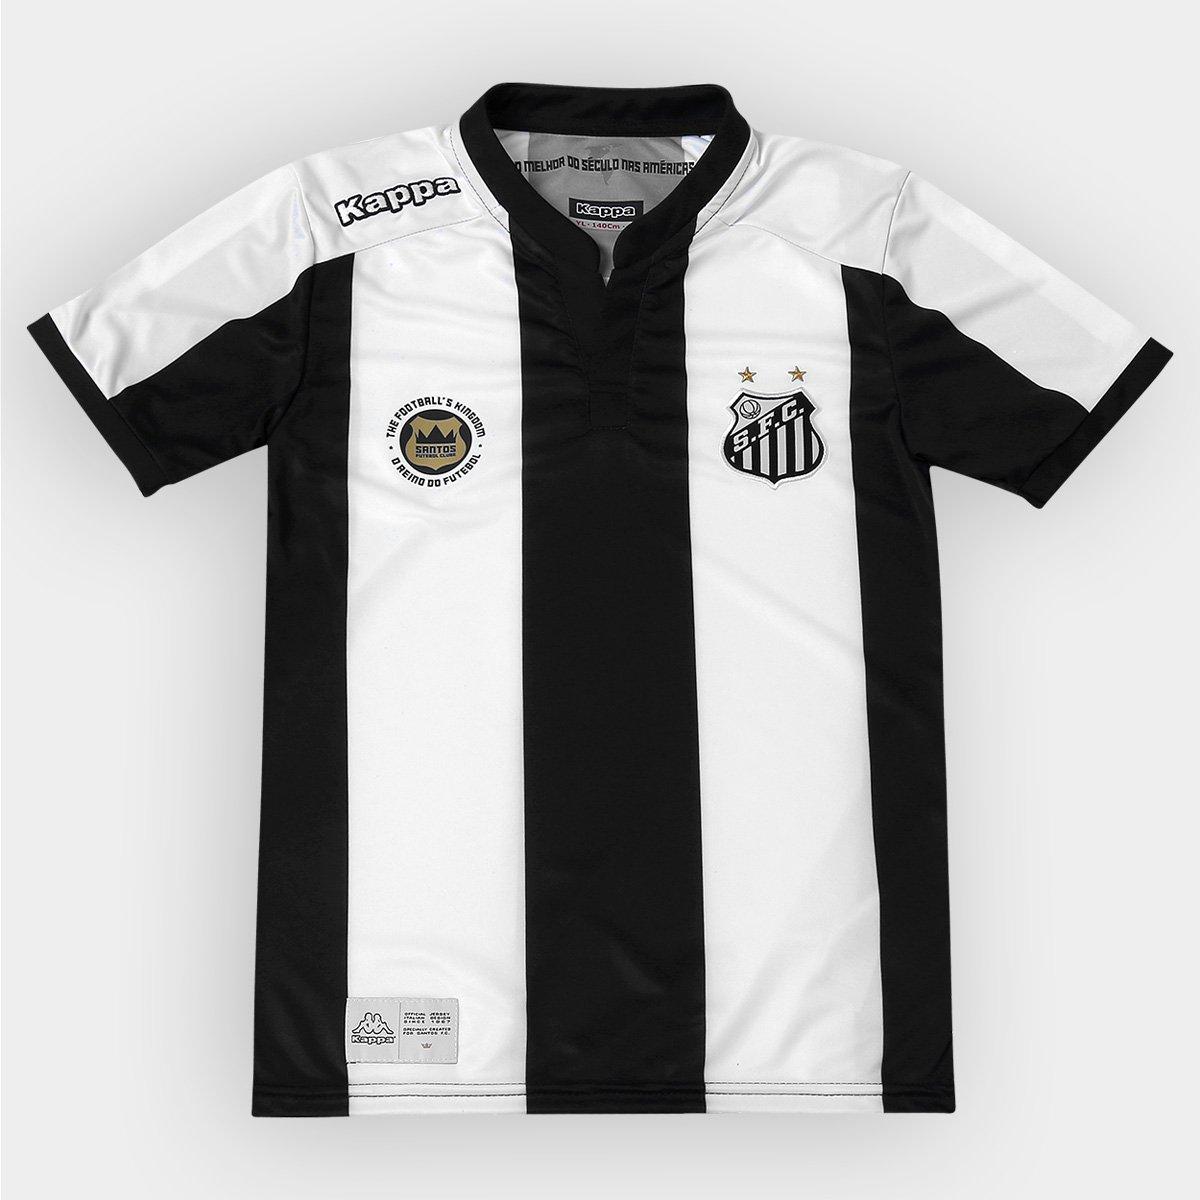 46e69adb74 Camisa Santos Infantil II 2016 s nº - Torcedor Kappa - Compre Agora ...